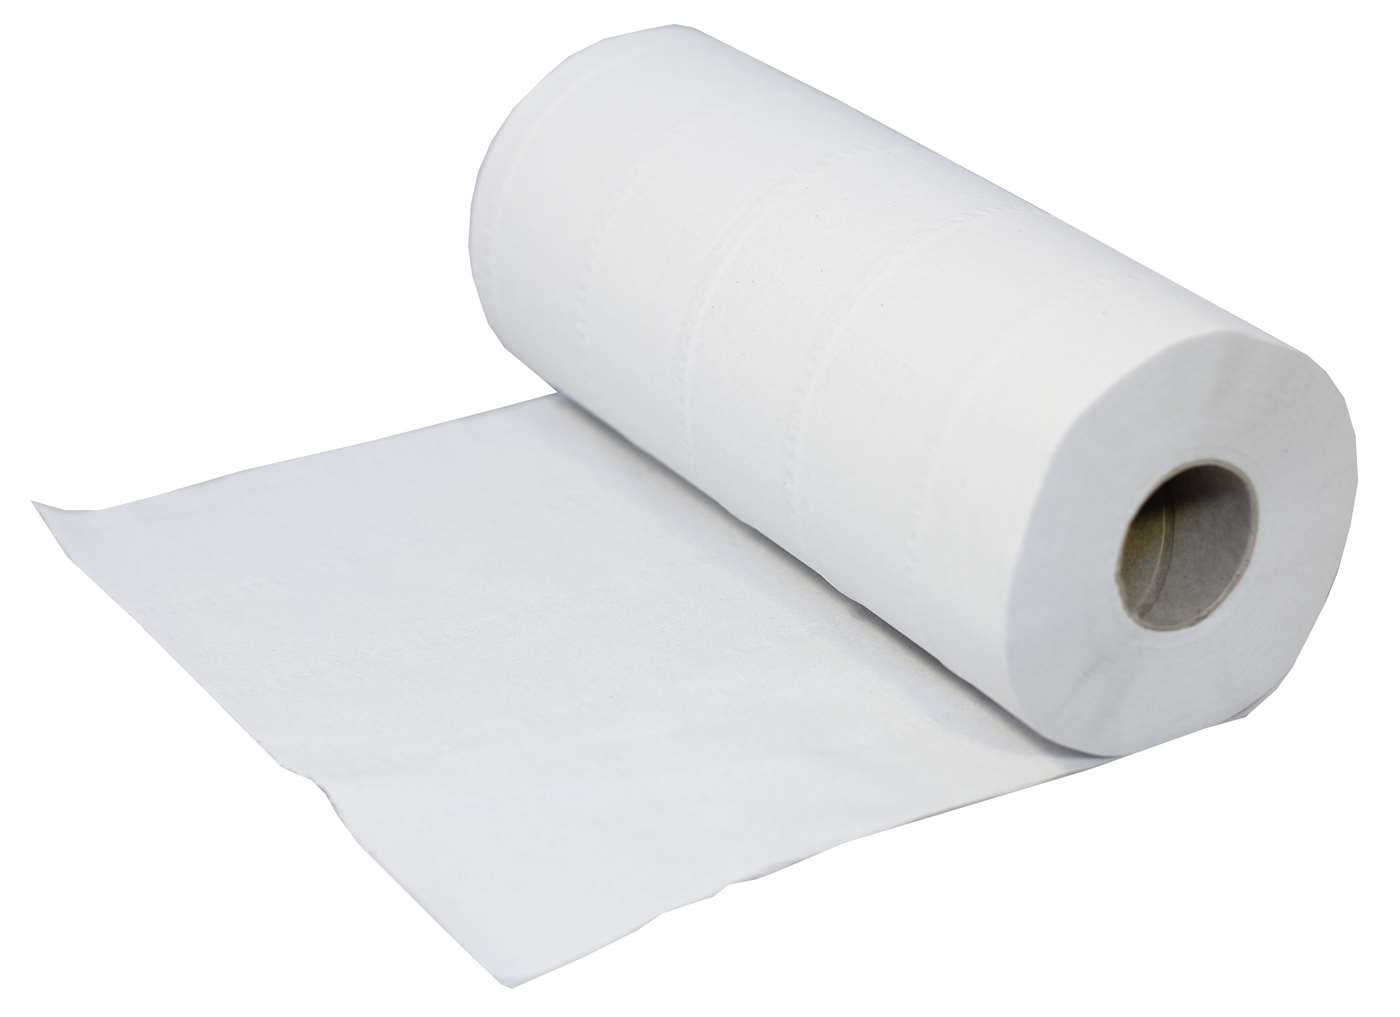 PRO Hygiene Roll 2 Ply White 25cm x 40m 100 sheets per roll